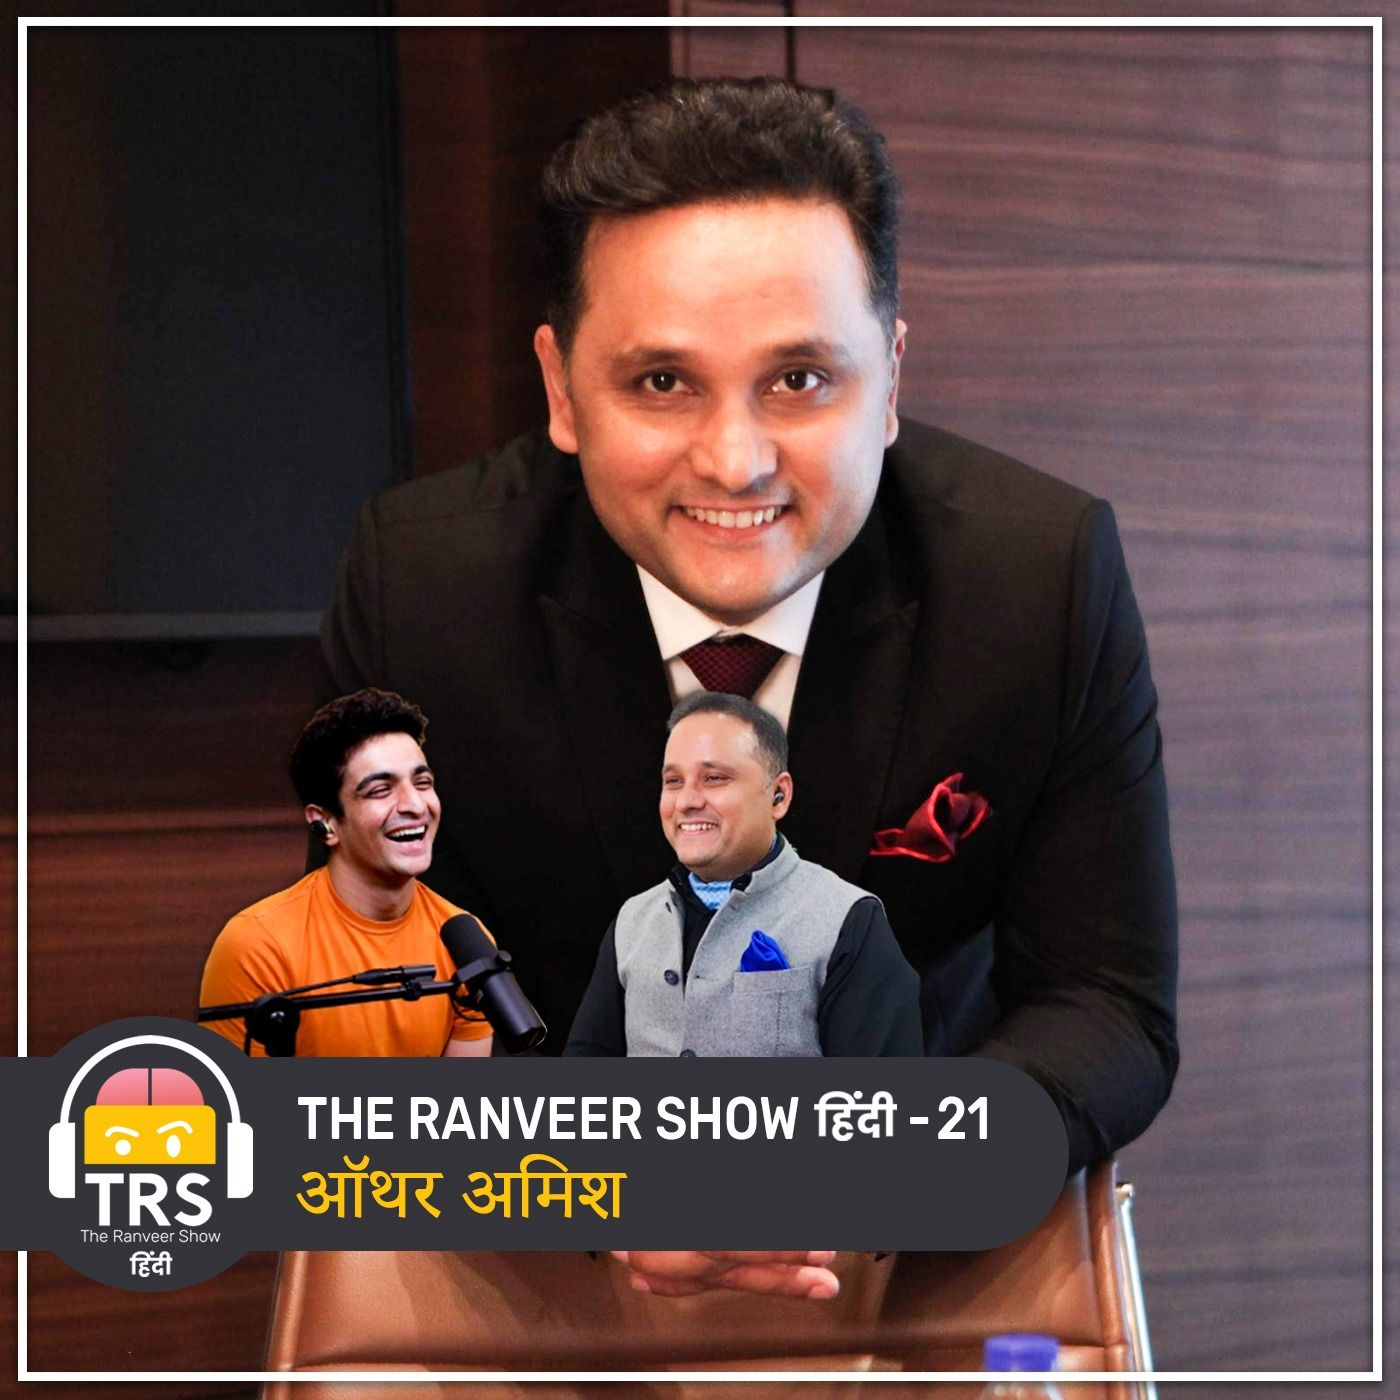 The REAL History Of Ramayana And Mahabharata ft. Author Amish Tripathi | The Ranveer Show हिंदी 21